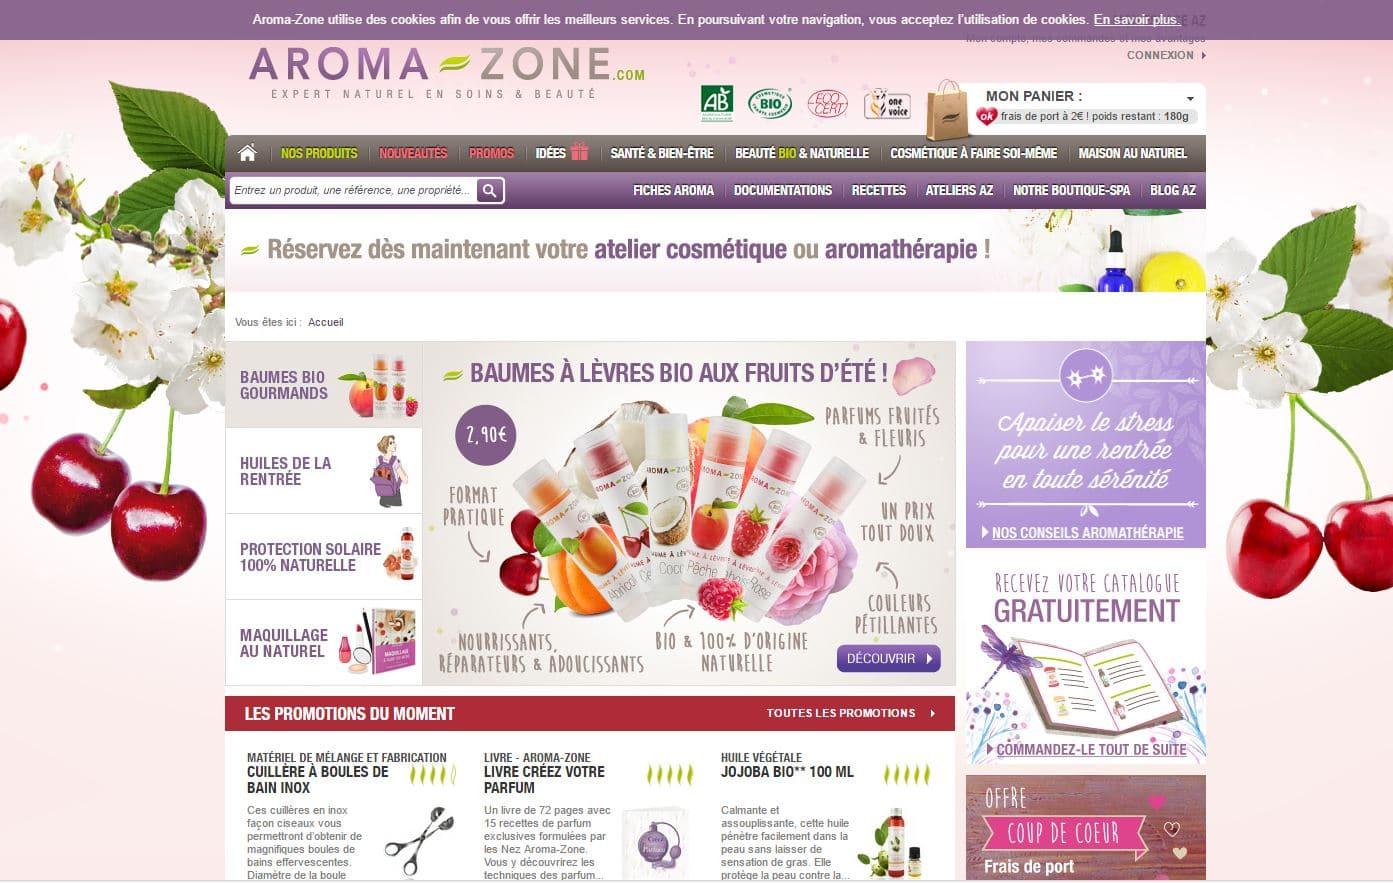 aroma-zone homepage